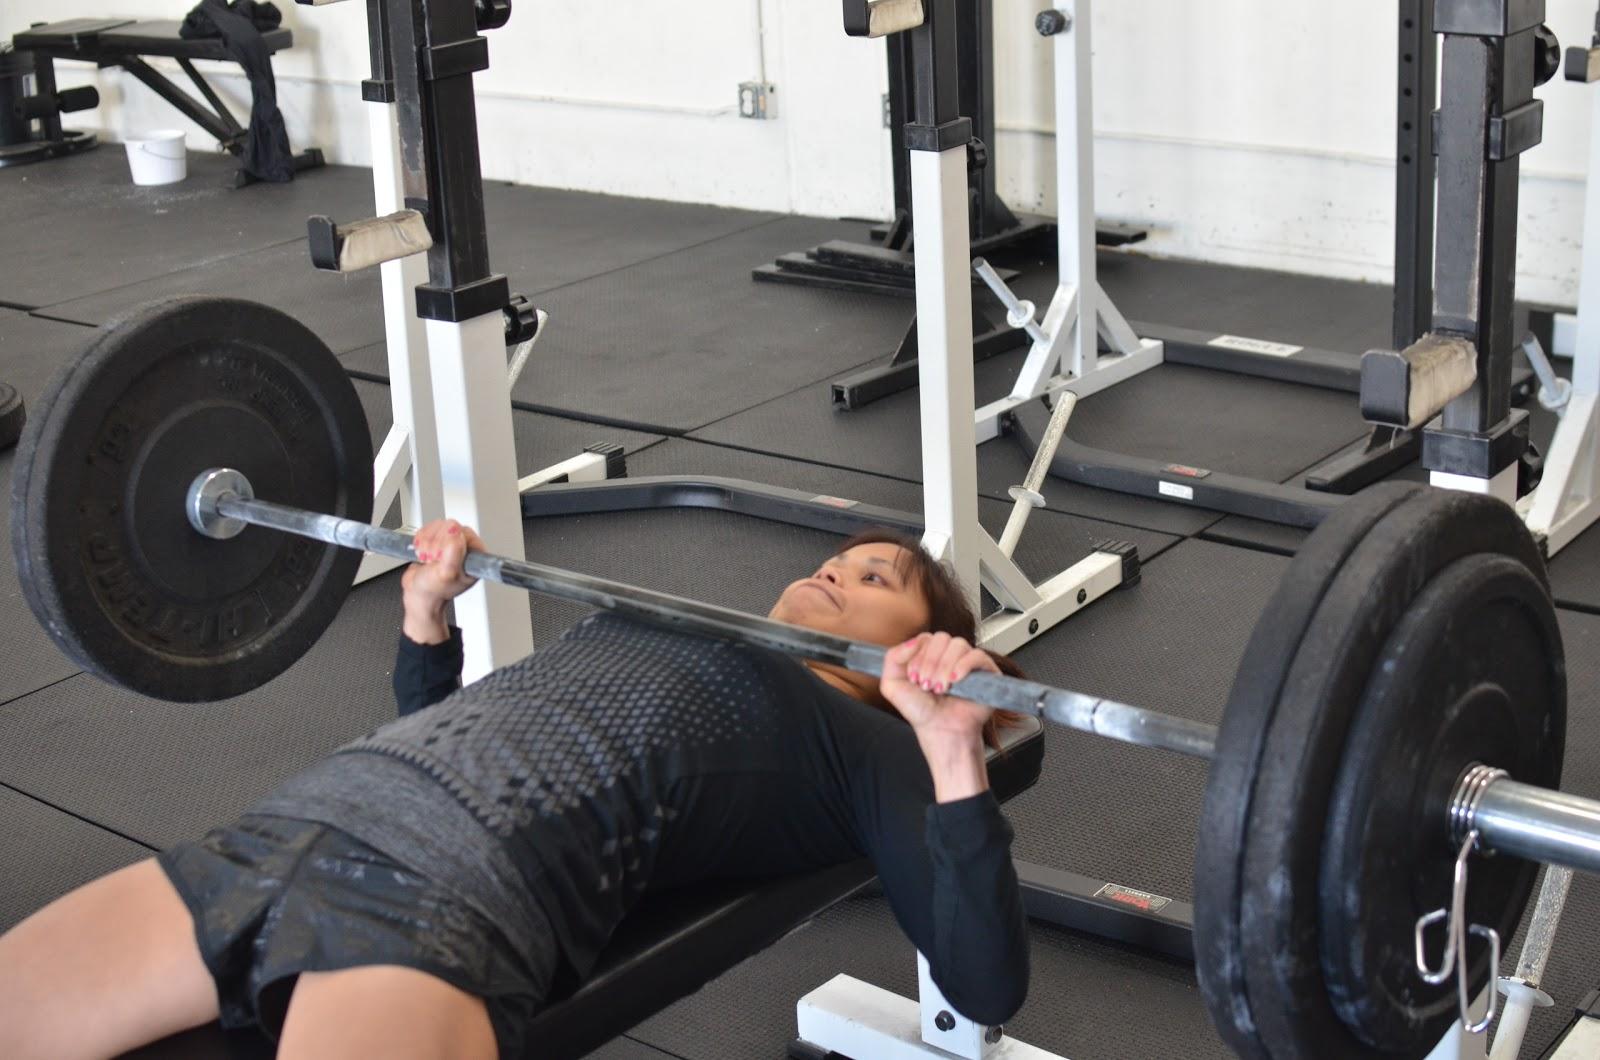 Jes' CrossFit Blog: Wendler's 5/3/1 Strength